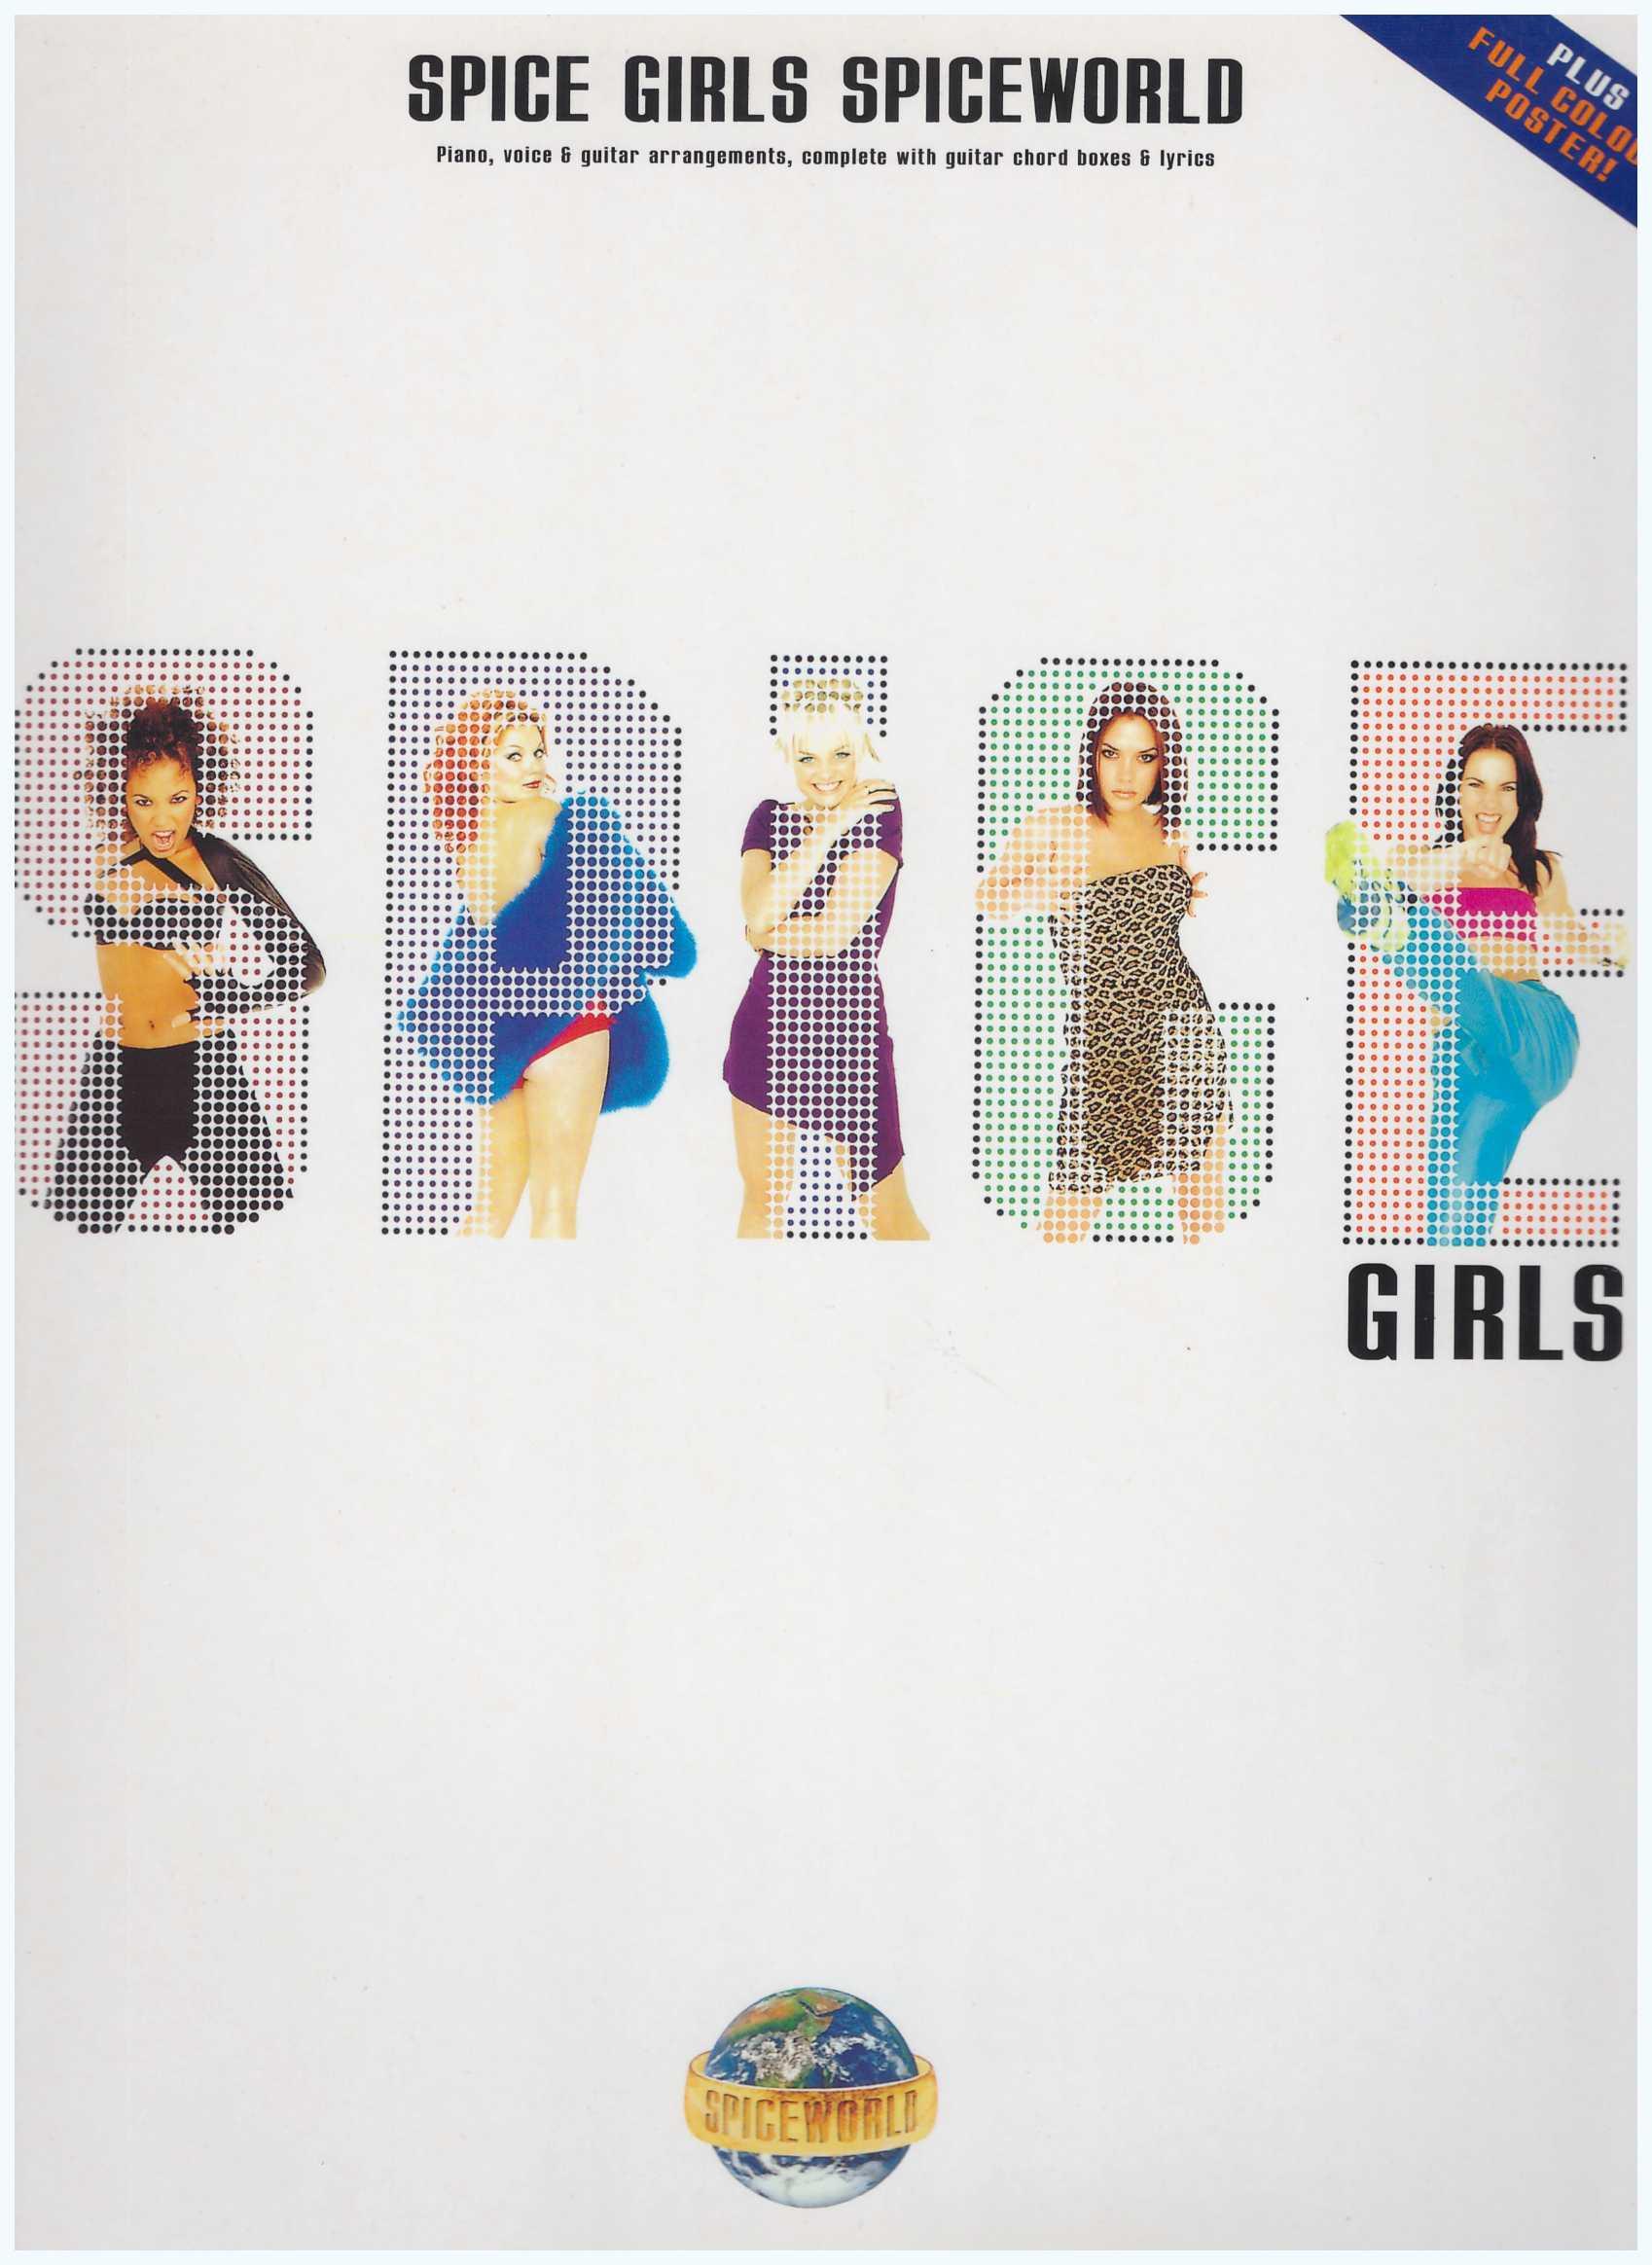 Spice Girls Spiceworld / PVG Book / Piano Book / Pop Song Book / Vocal Book / Voice Book / Guitar Book / Gitar Book